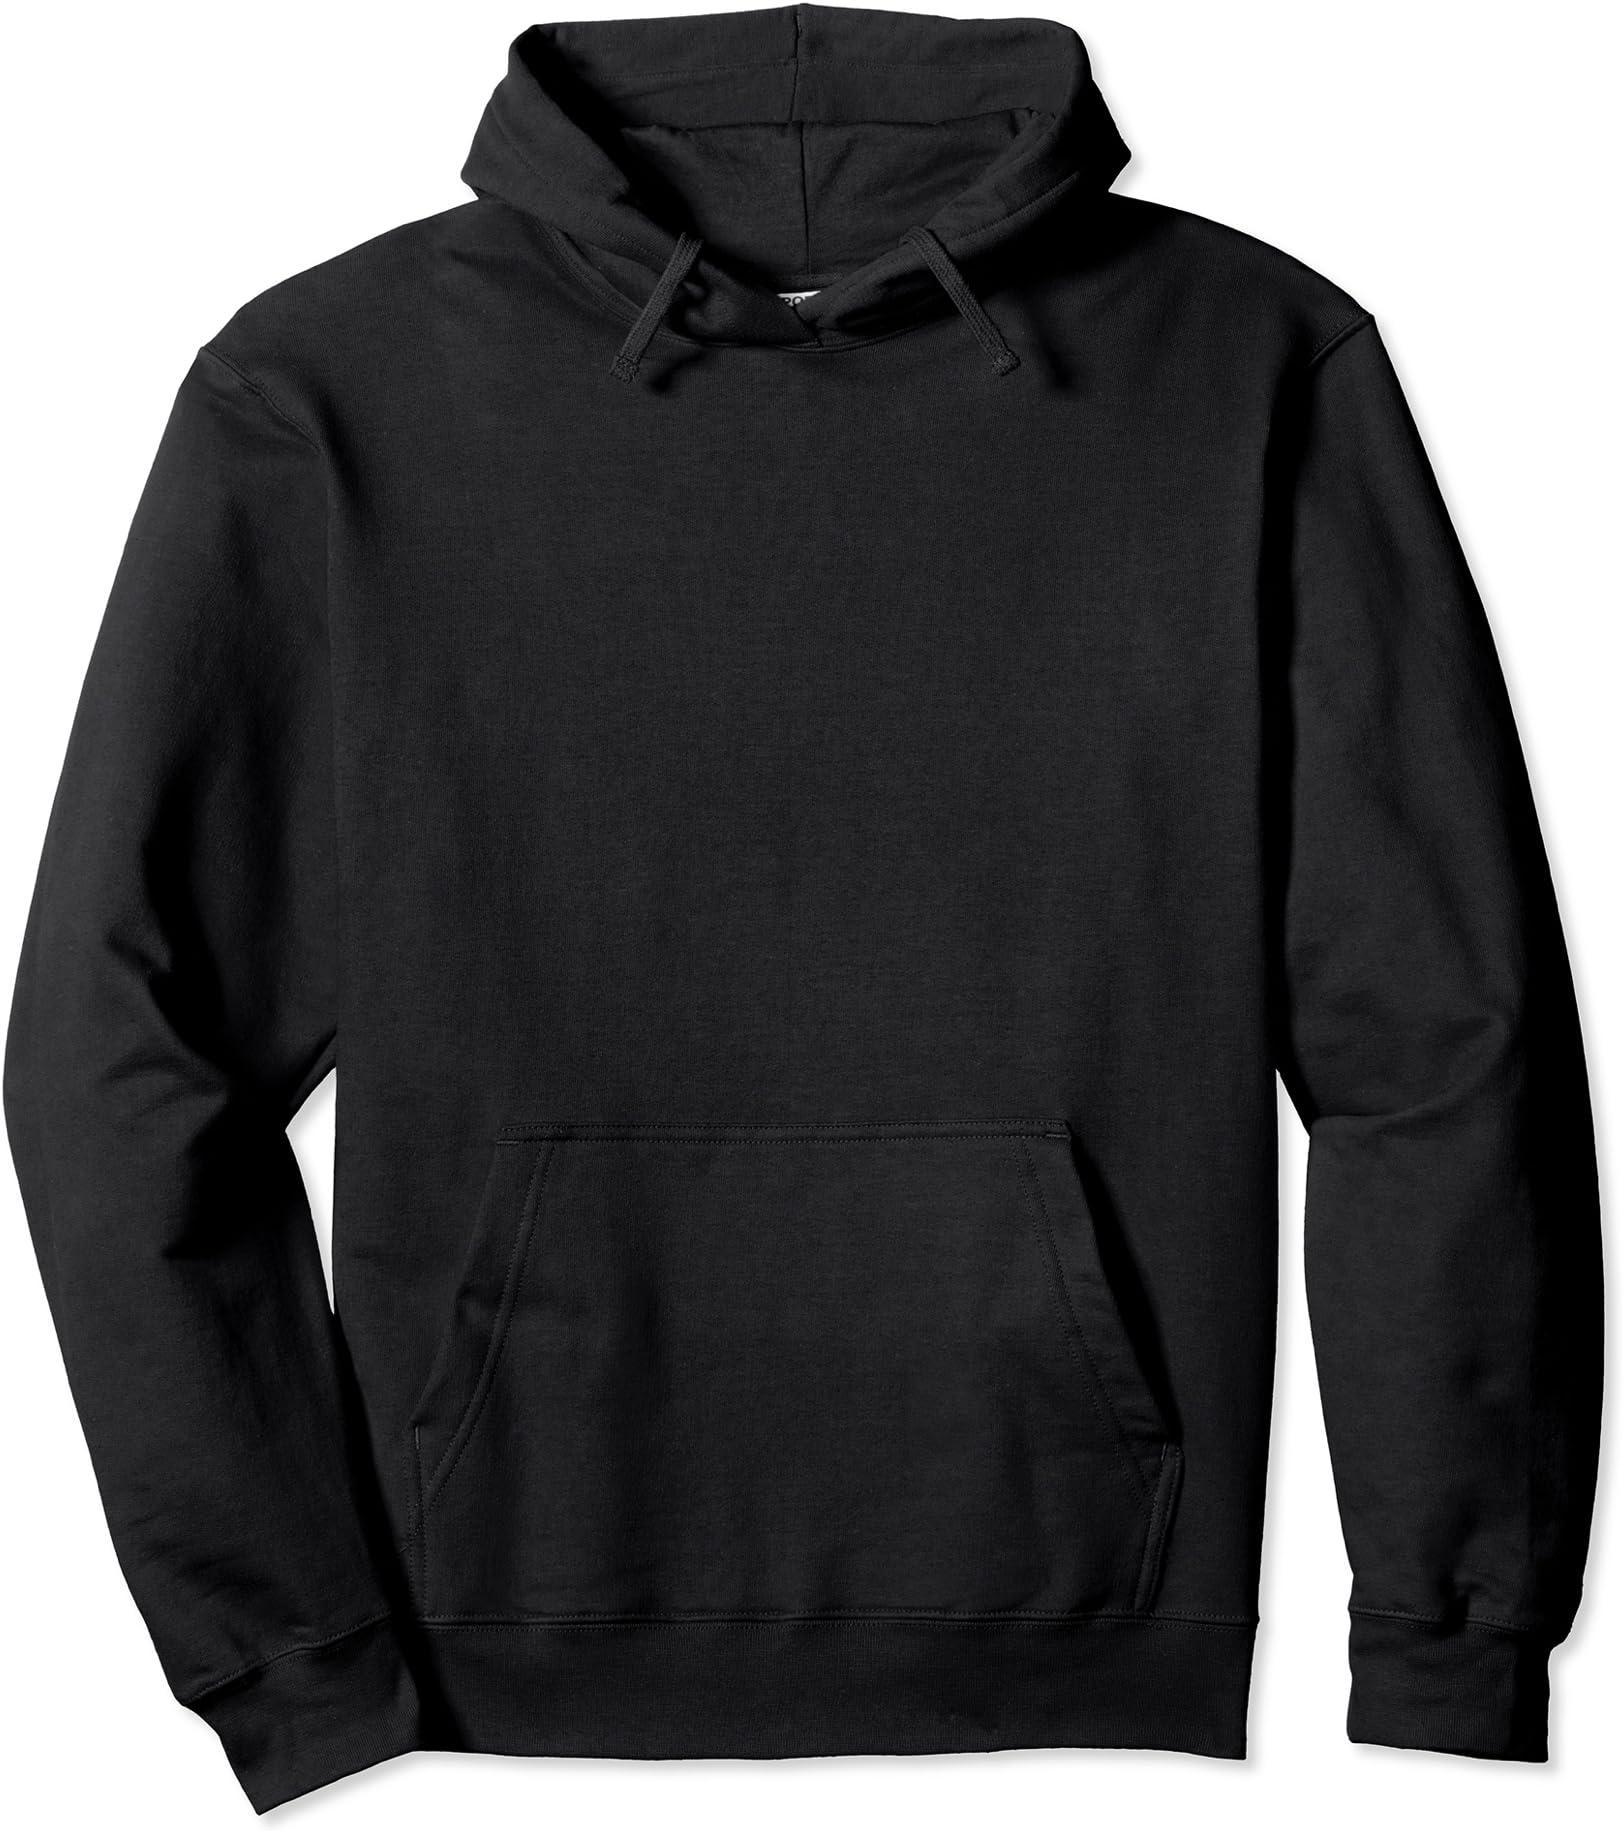 Philadelphia Philly Love Sport Teams Fan Unisex Sweatshirt Hooded Shirt Hoodie